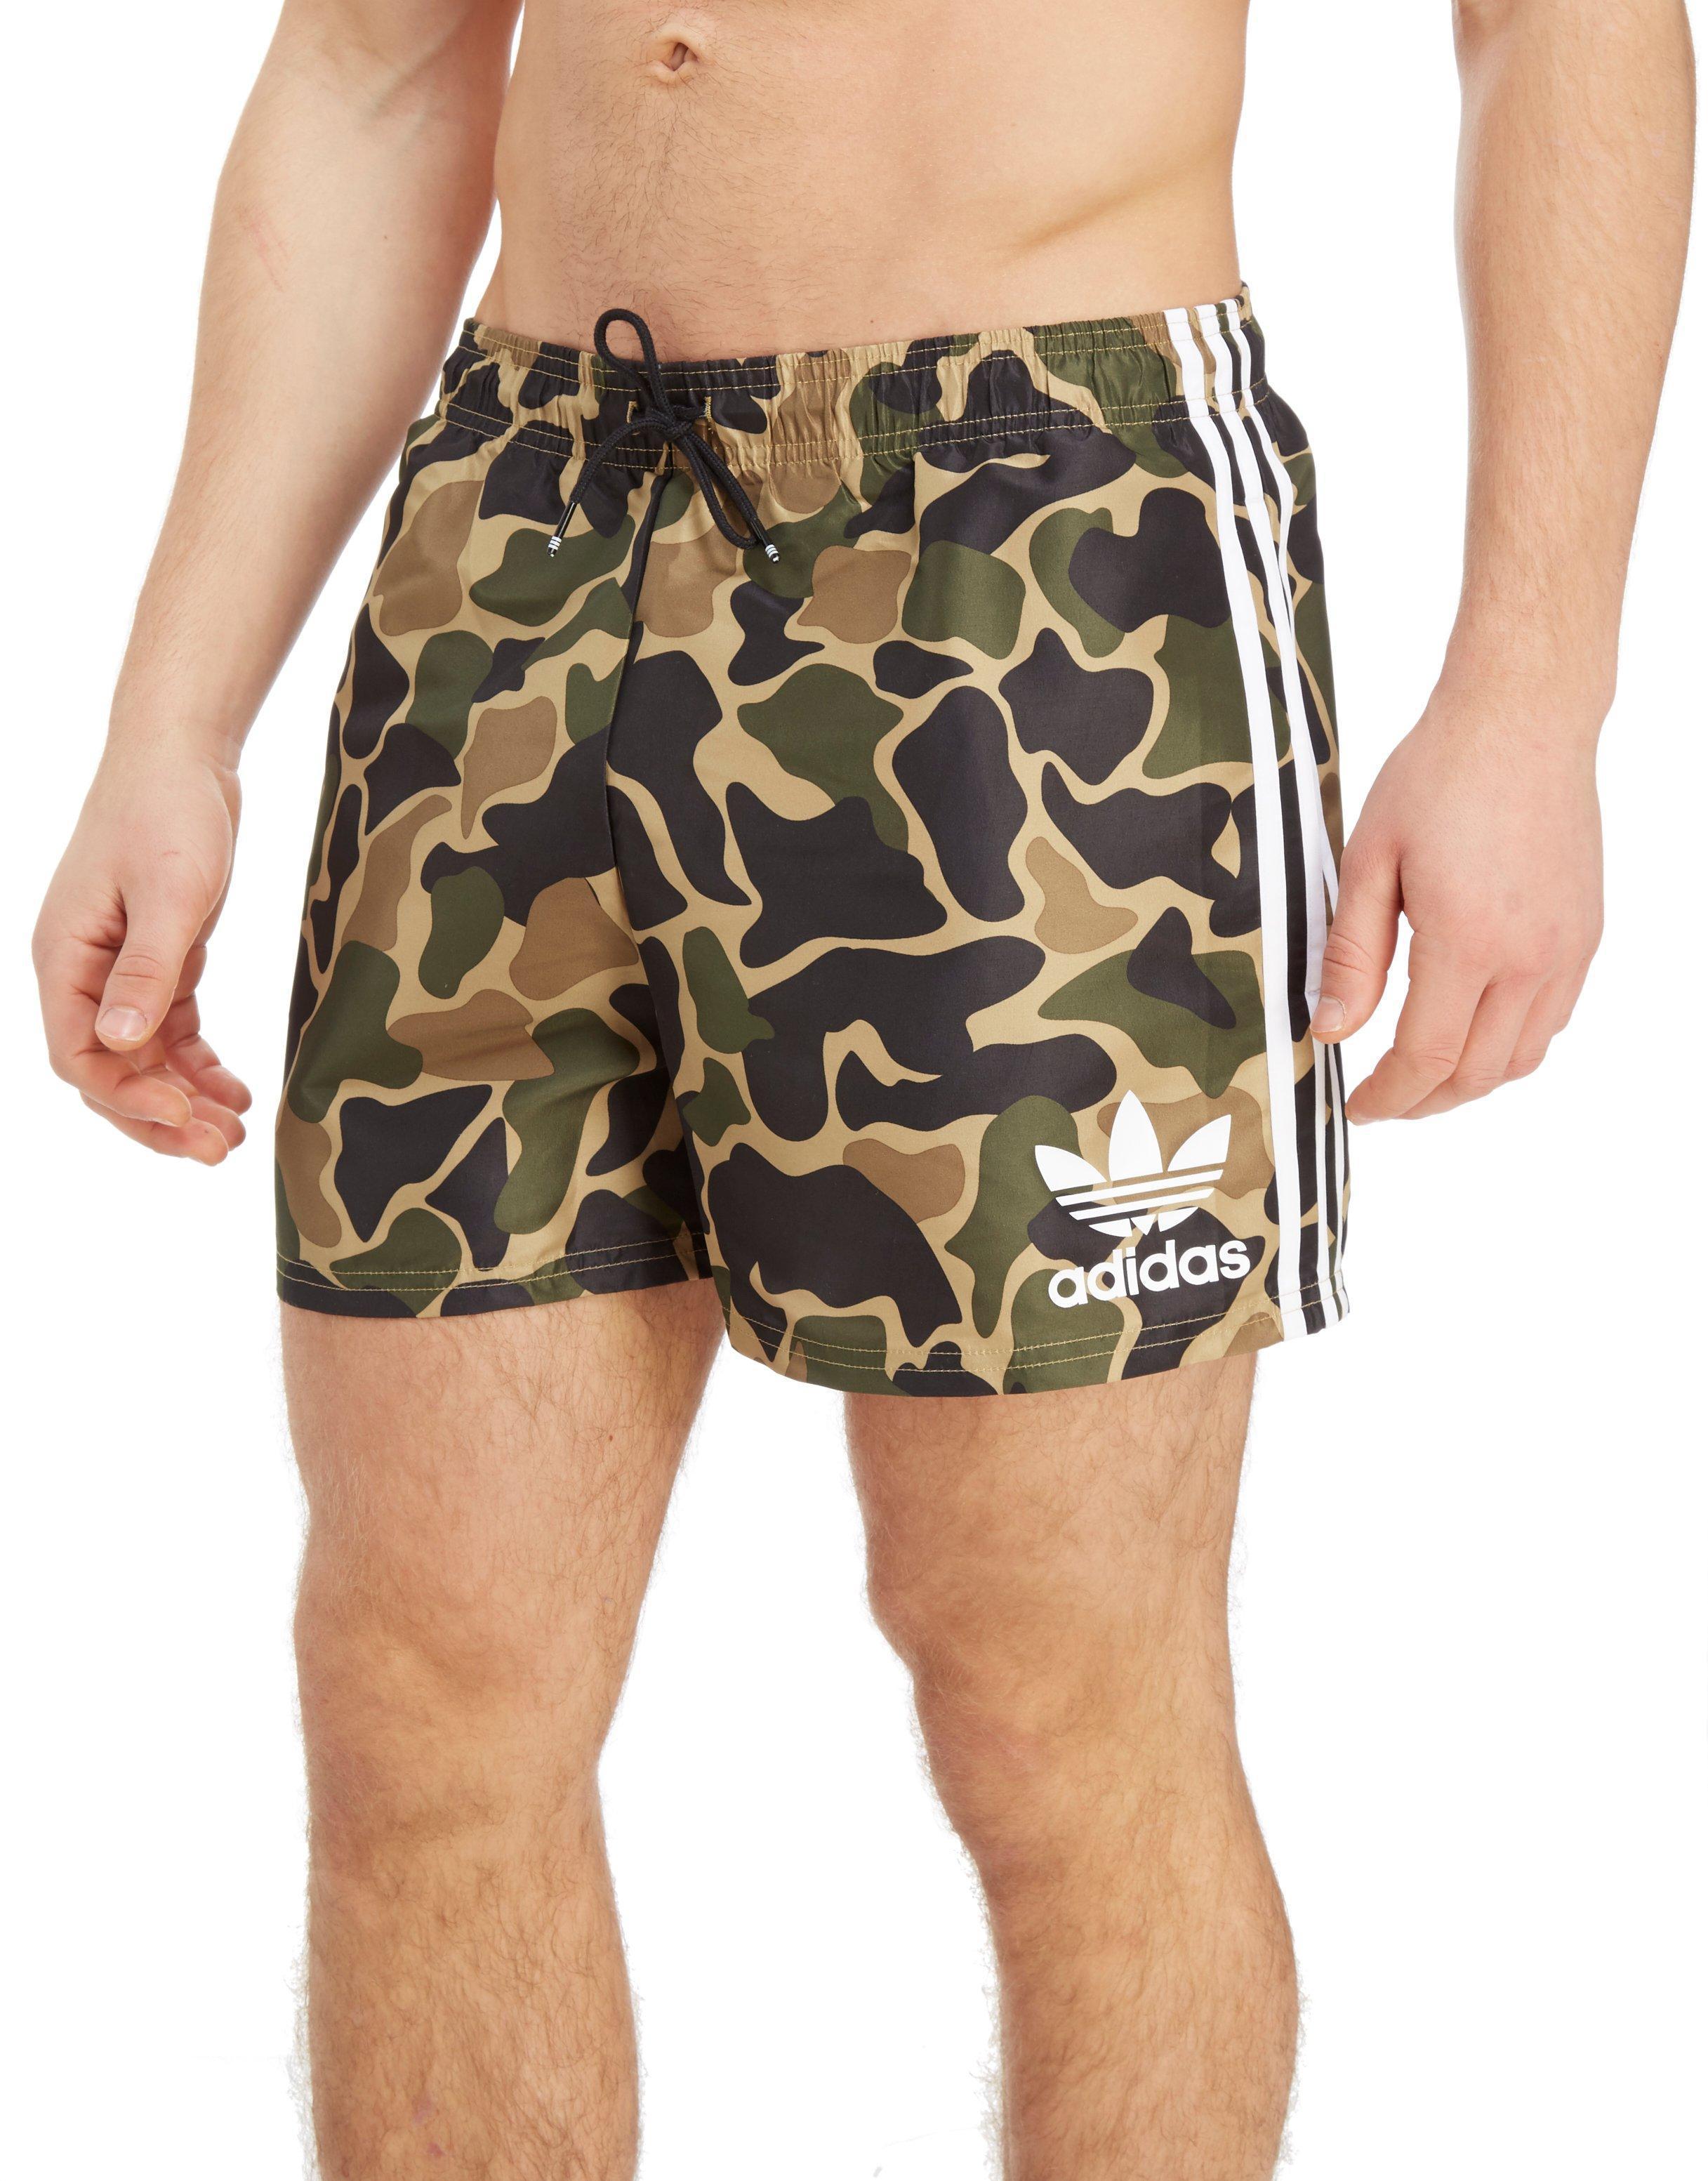 Men Woven Adidas Lyst For Originals Swim Shorts YUq4Awq